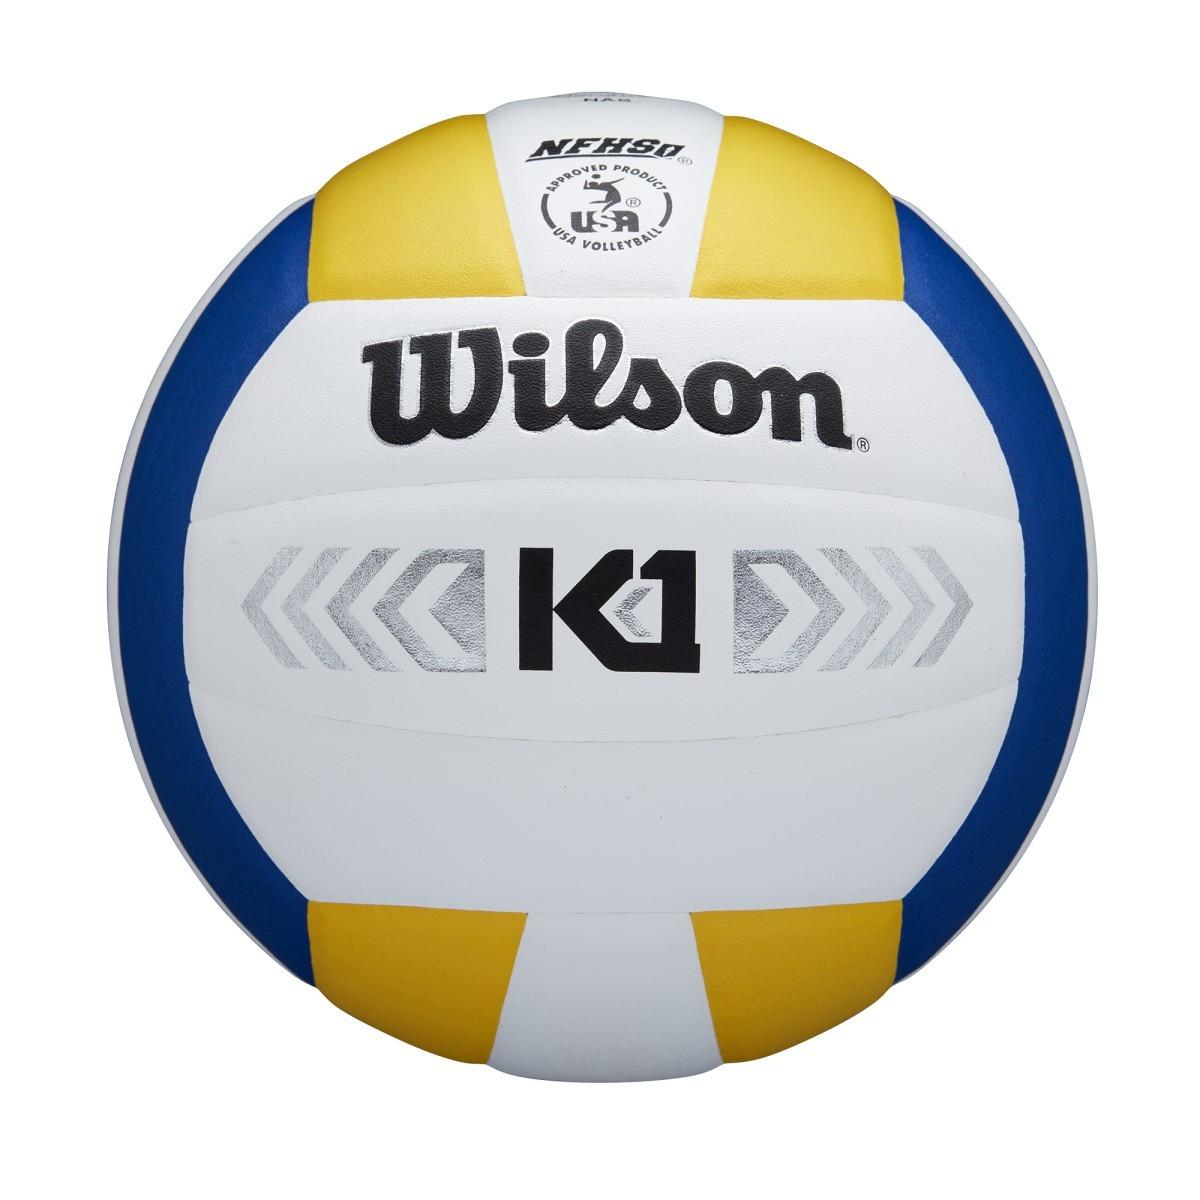 Wilson K1 Silver- Yellow/White/Blue